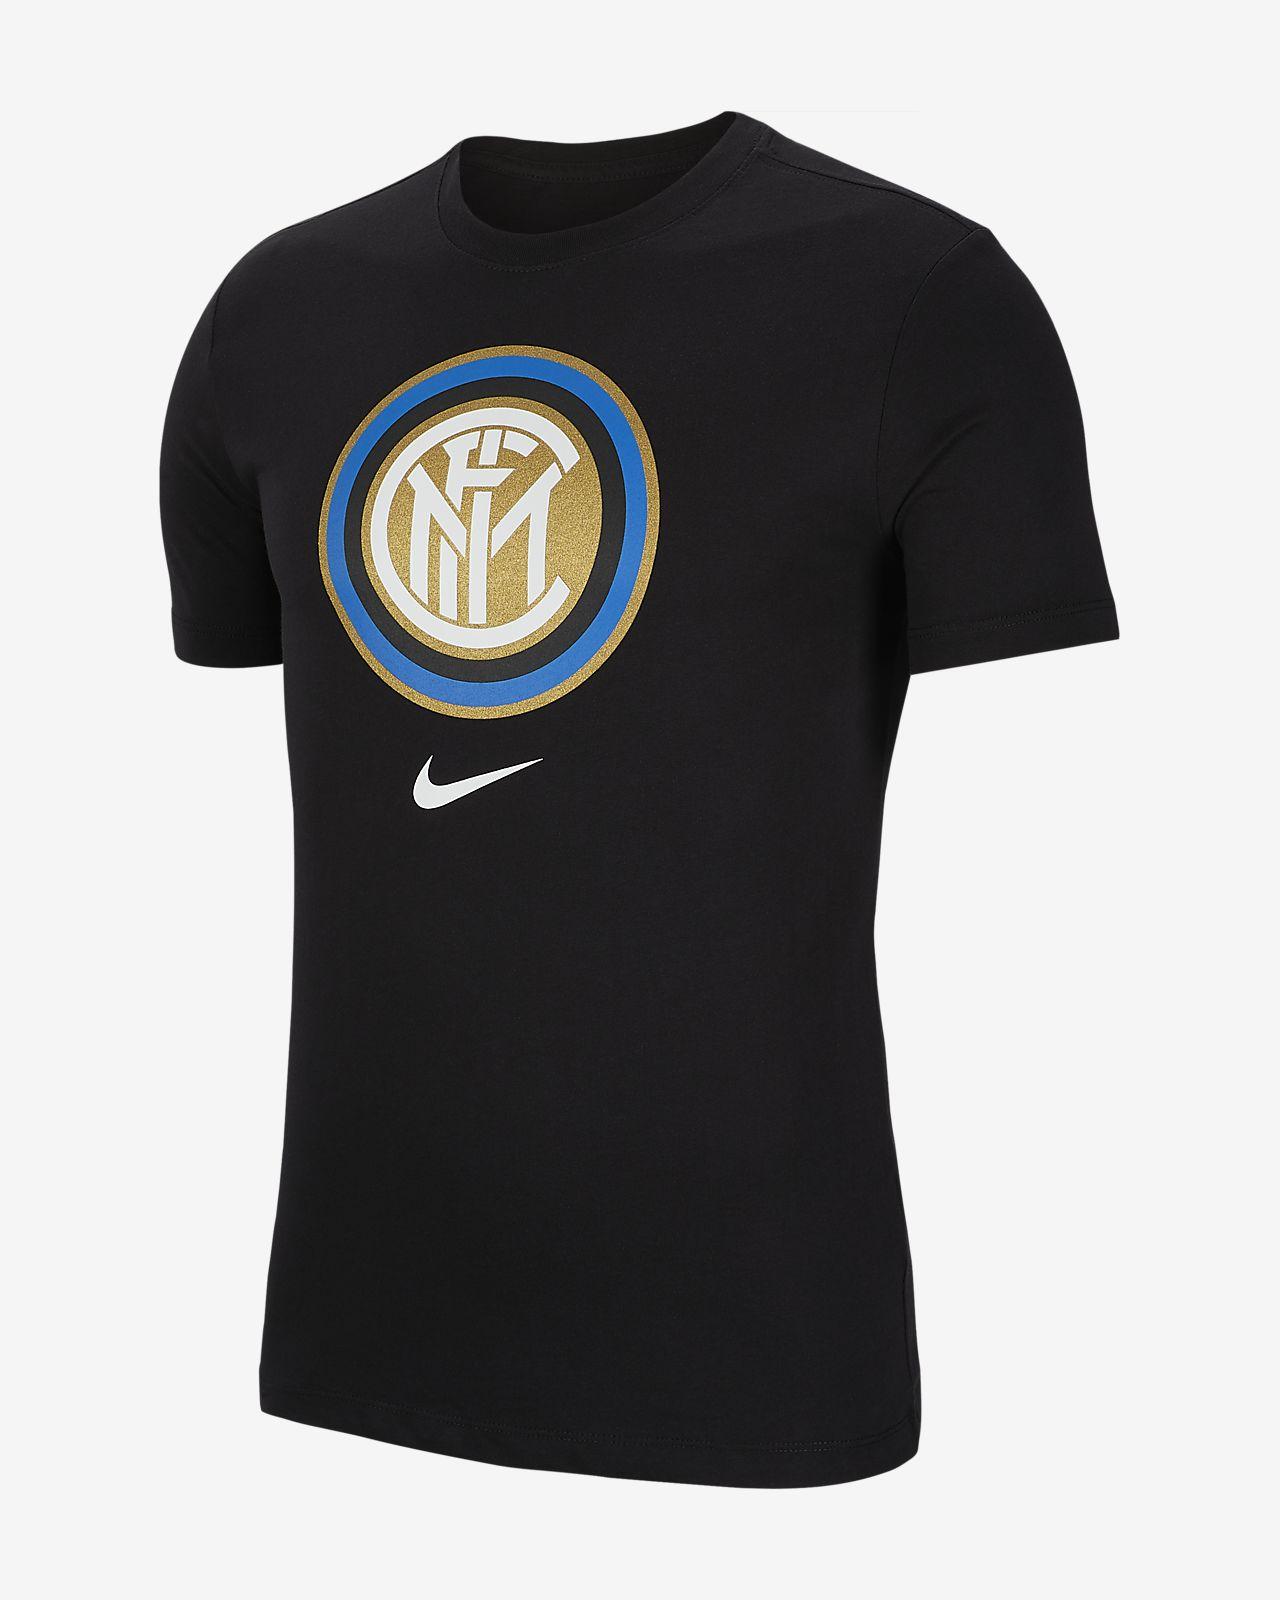 Playera para hombre Inter Milan